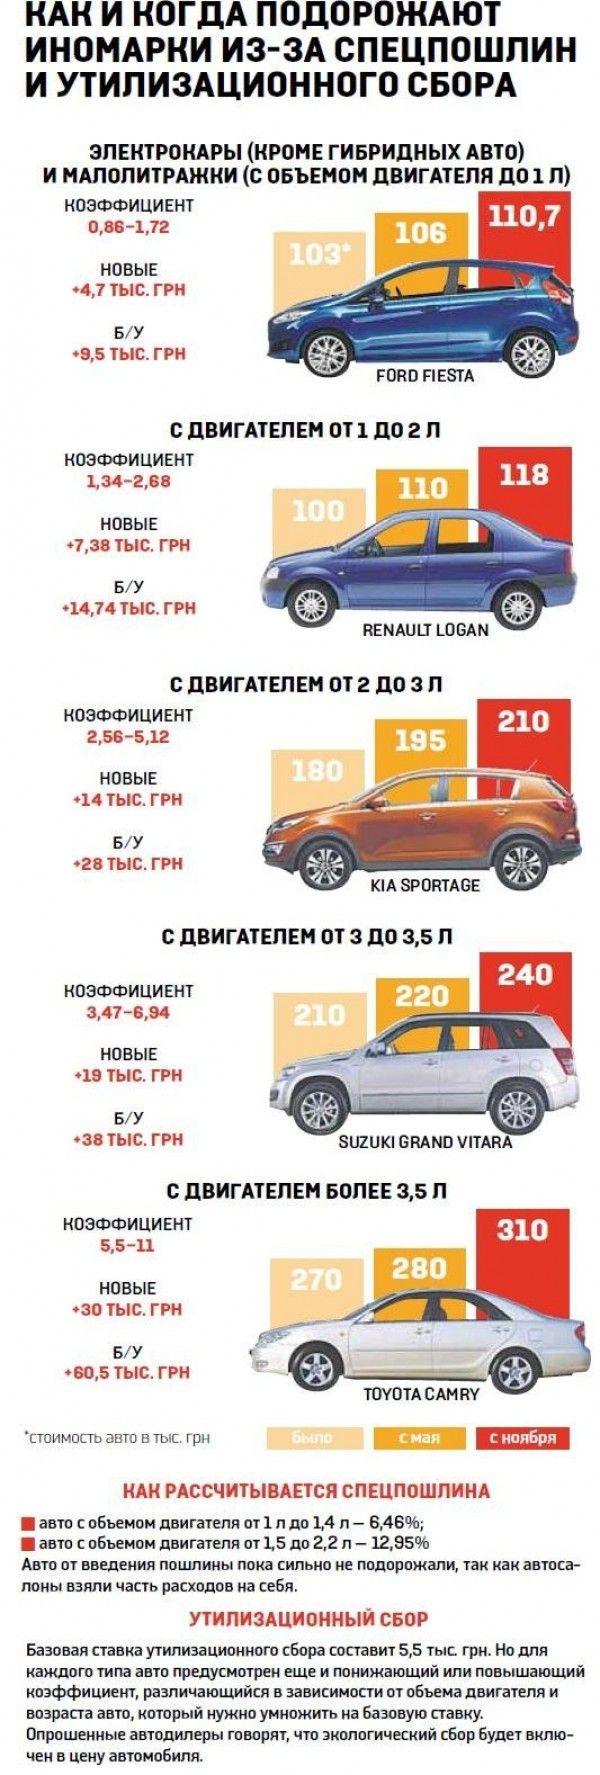 Утилсбор: Киев оплатил 8,7 млн за 760 автомашин